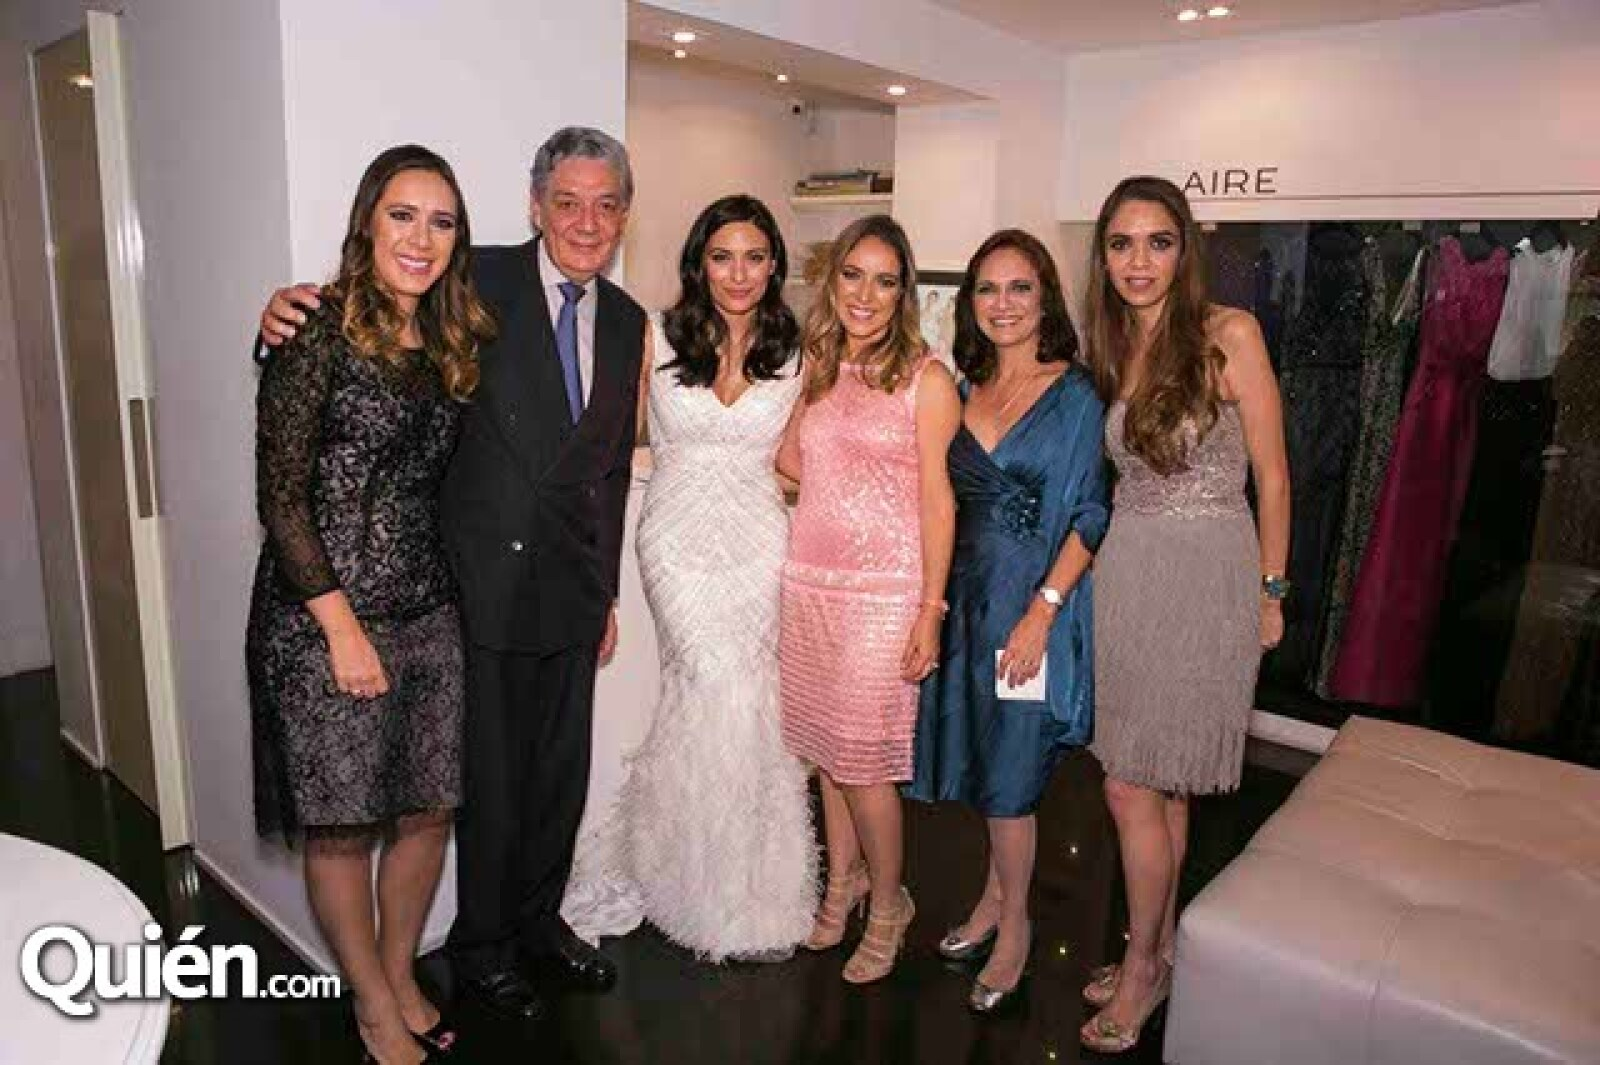 María Fernanda Amezcua,Alfredo Amezcua,Ana Brenda,Ana,Ana y Daniela Amezcua.